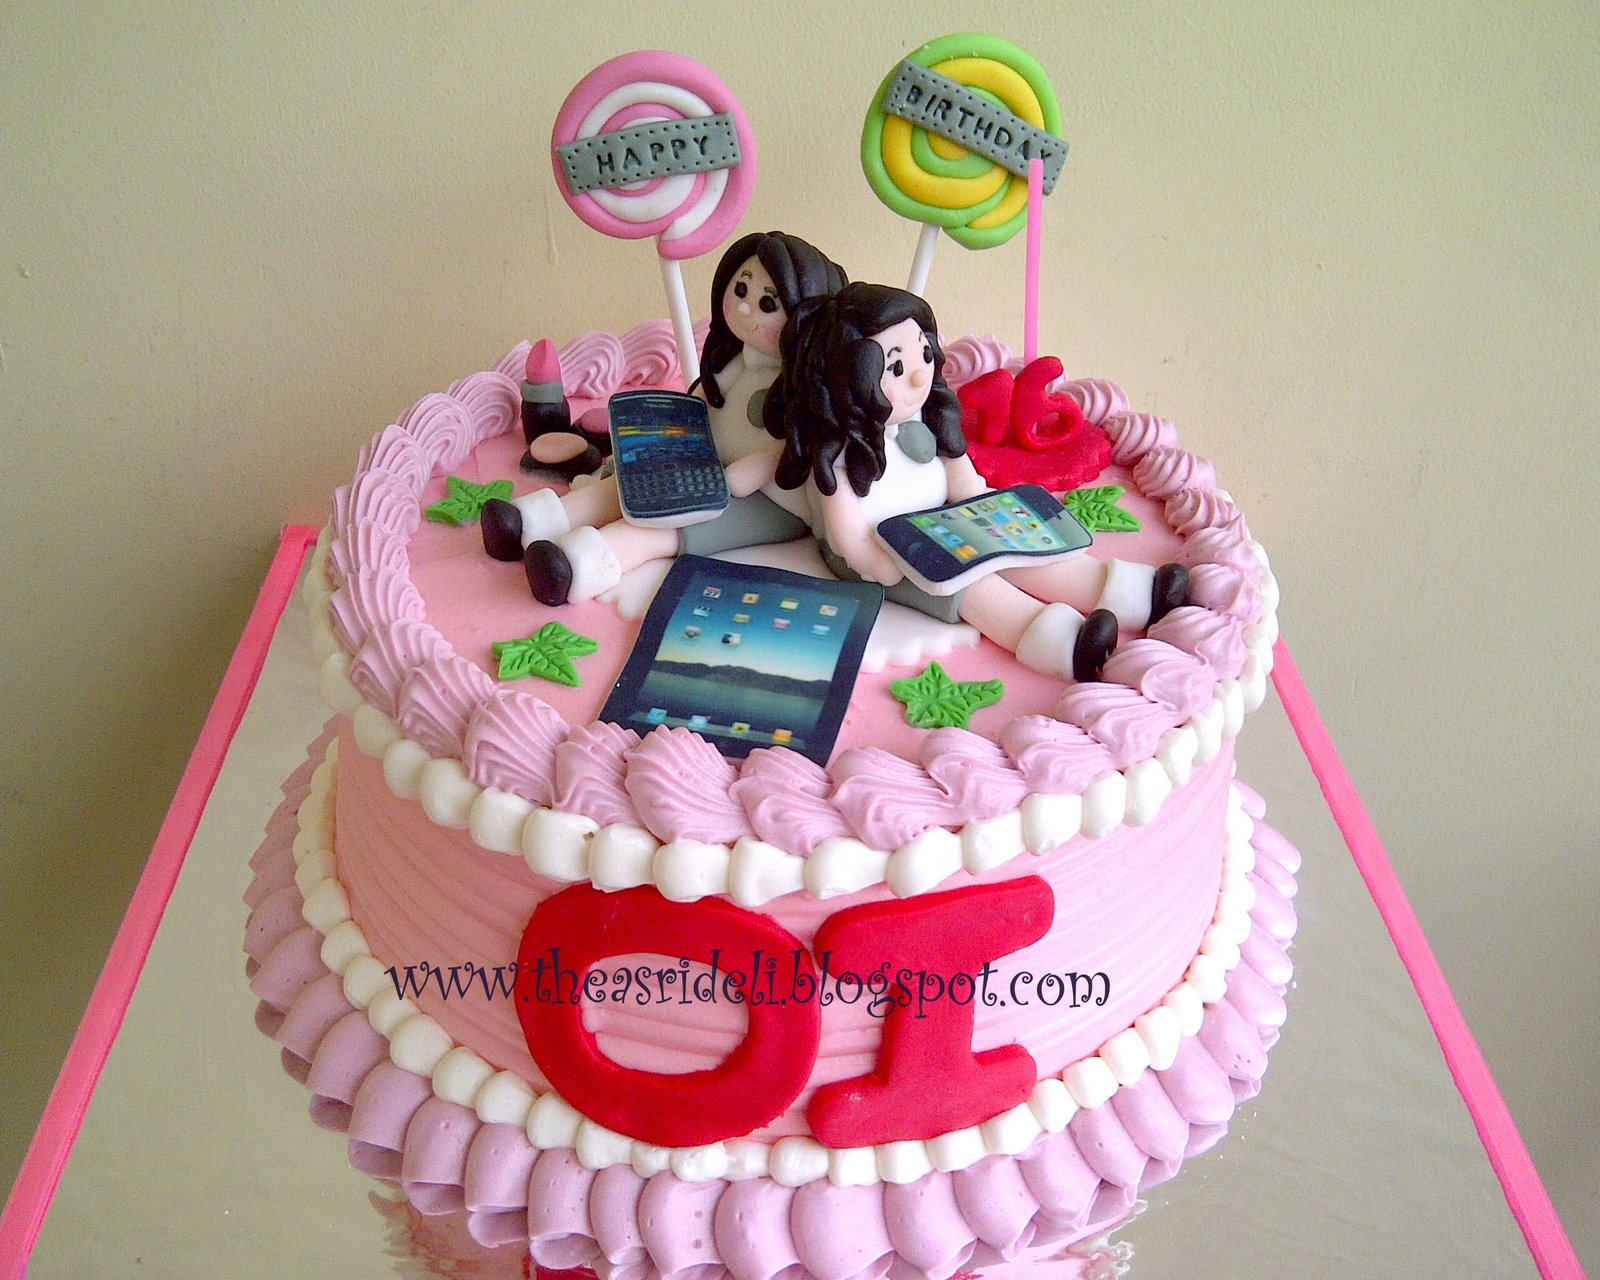 asrideli.com: Best Friends Cake